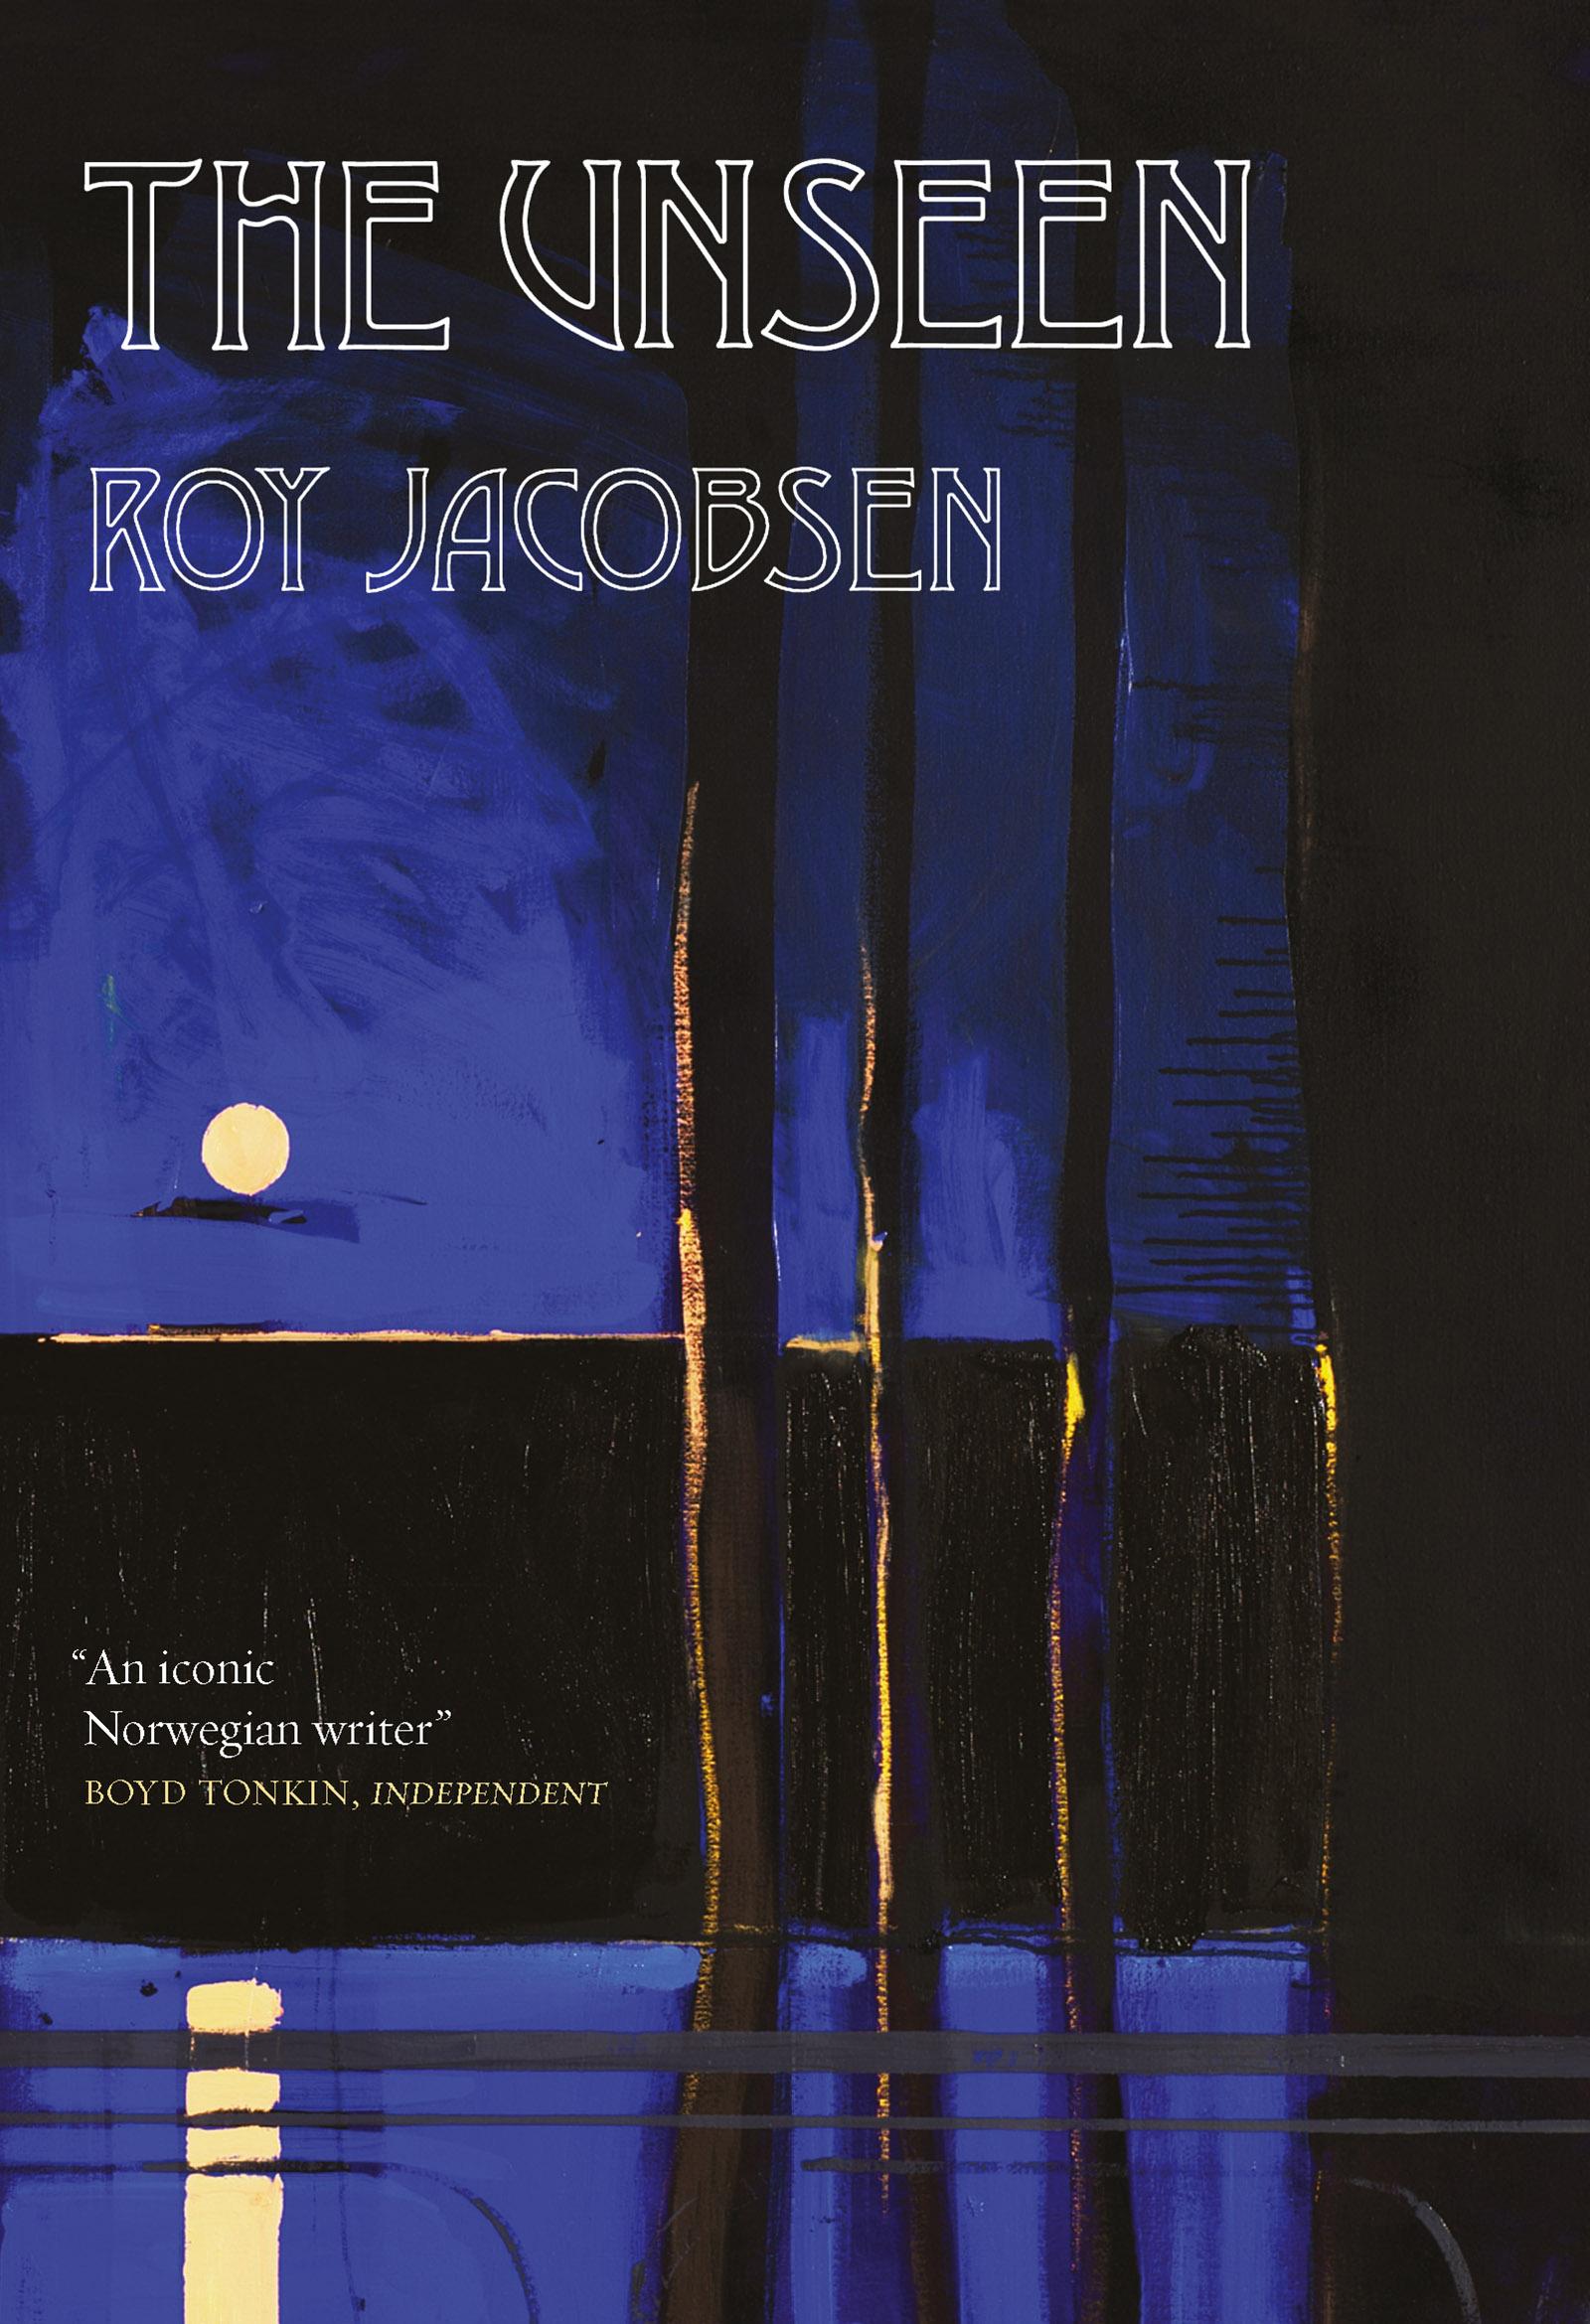 78.roy jacobsen the unseen